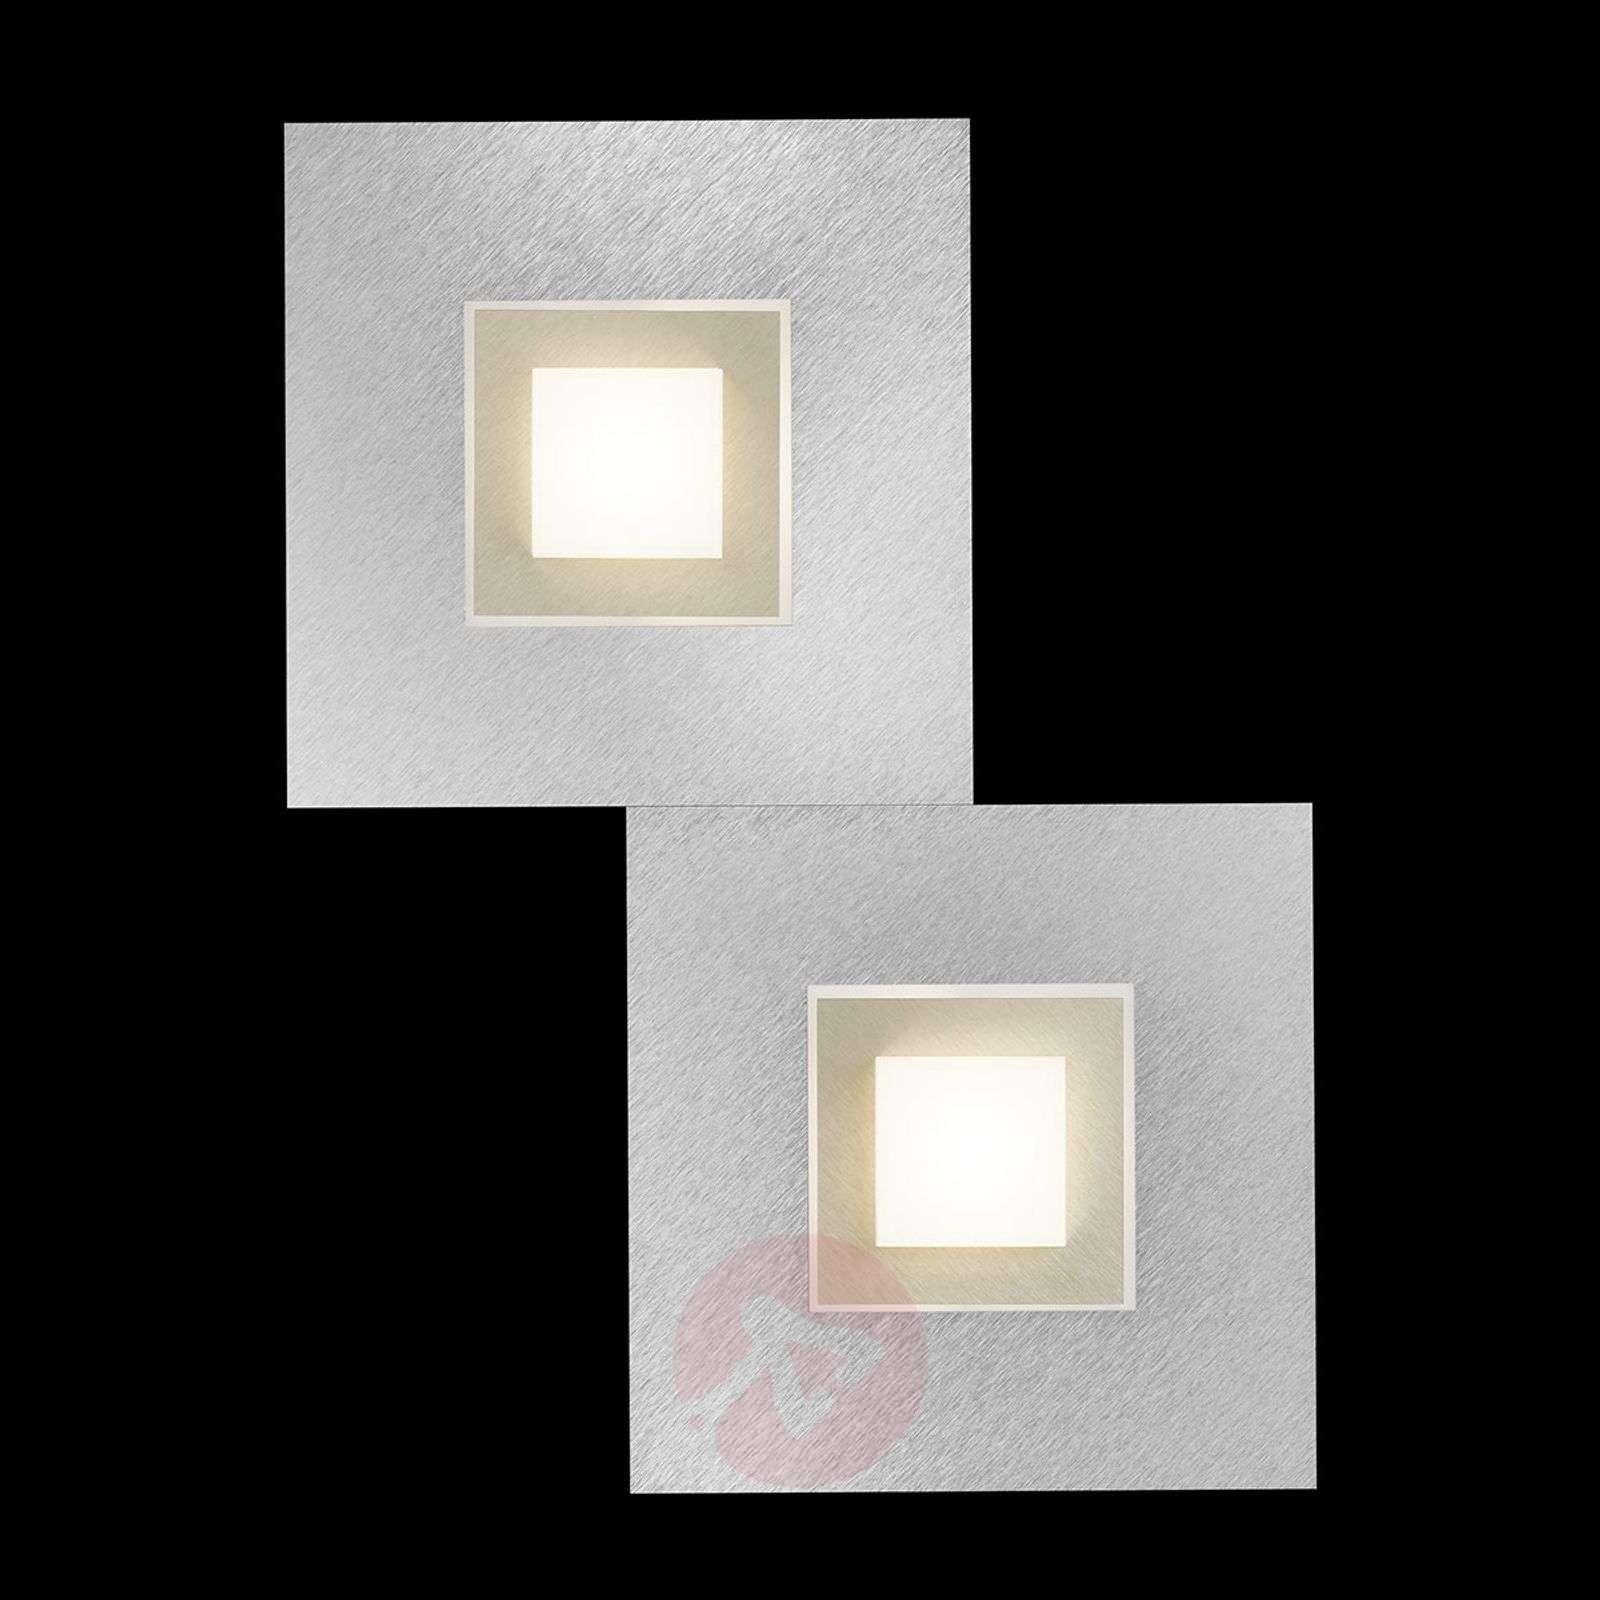 GROSSMANN Karree LED-seinävalaisin, 2-lampp.-4022043X-01